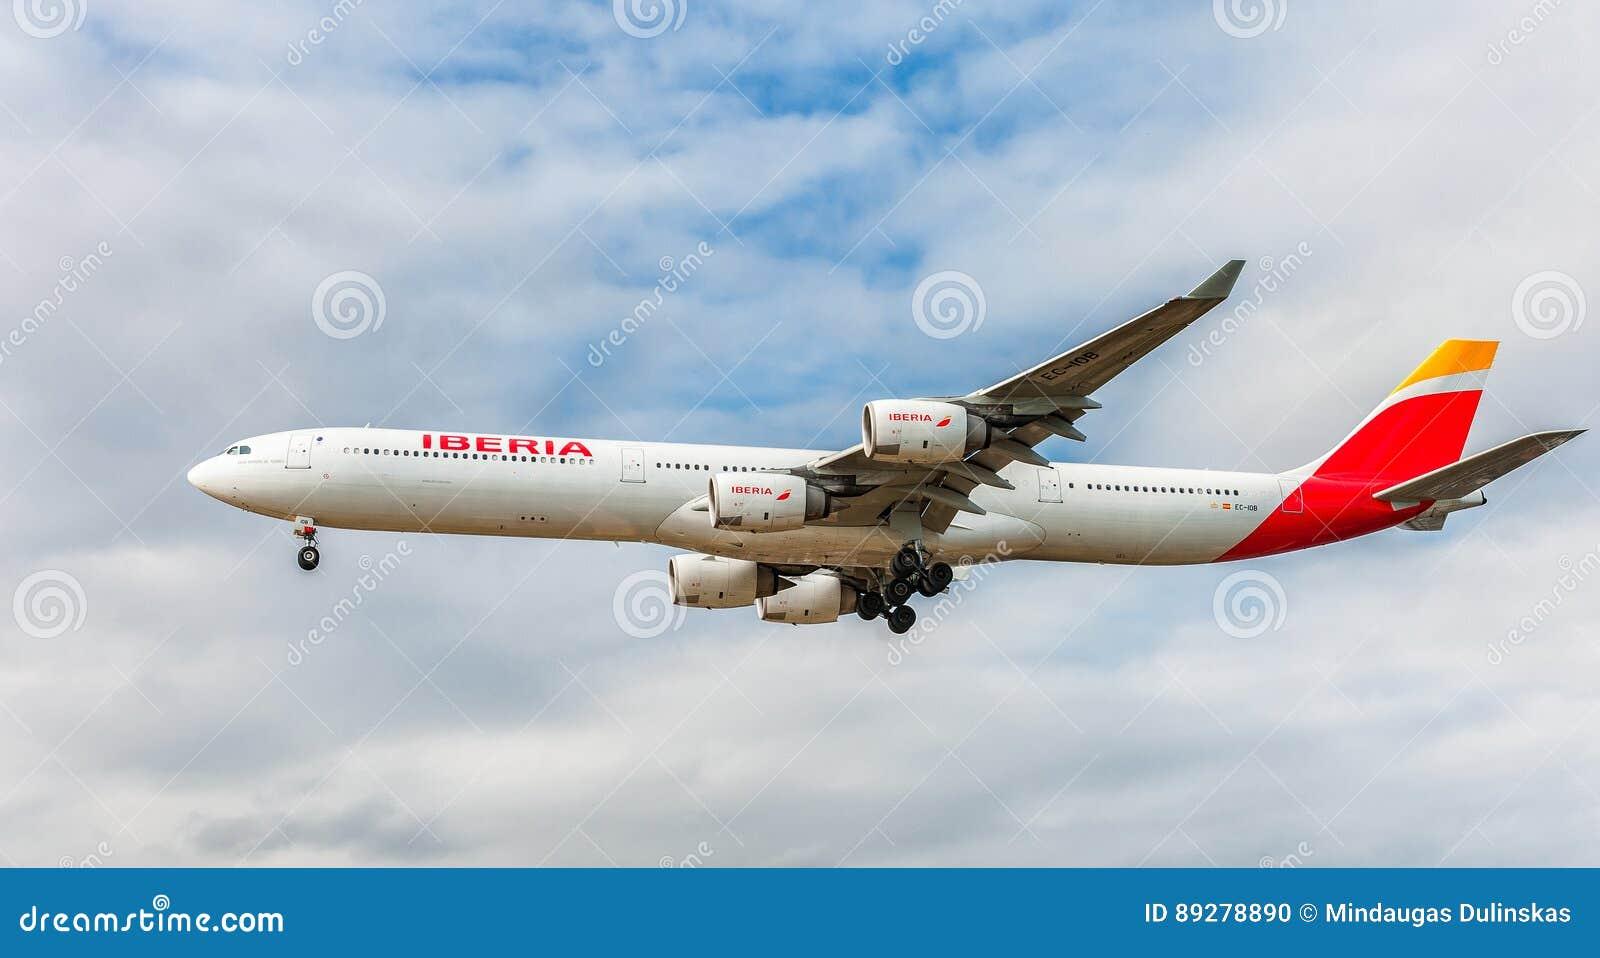 ЛОНДОН, АНГЛИЯ - 22-ОЕ АВГУСТА 2016: Посадка аэробуса A340 EC-IOB Iberia Airlines в авиапорте Хитроу, Лондоне